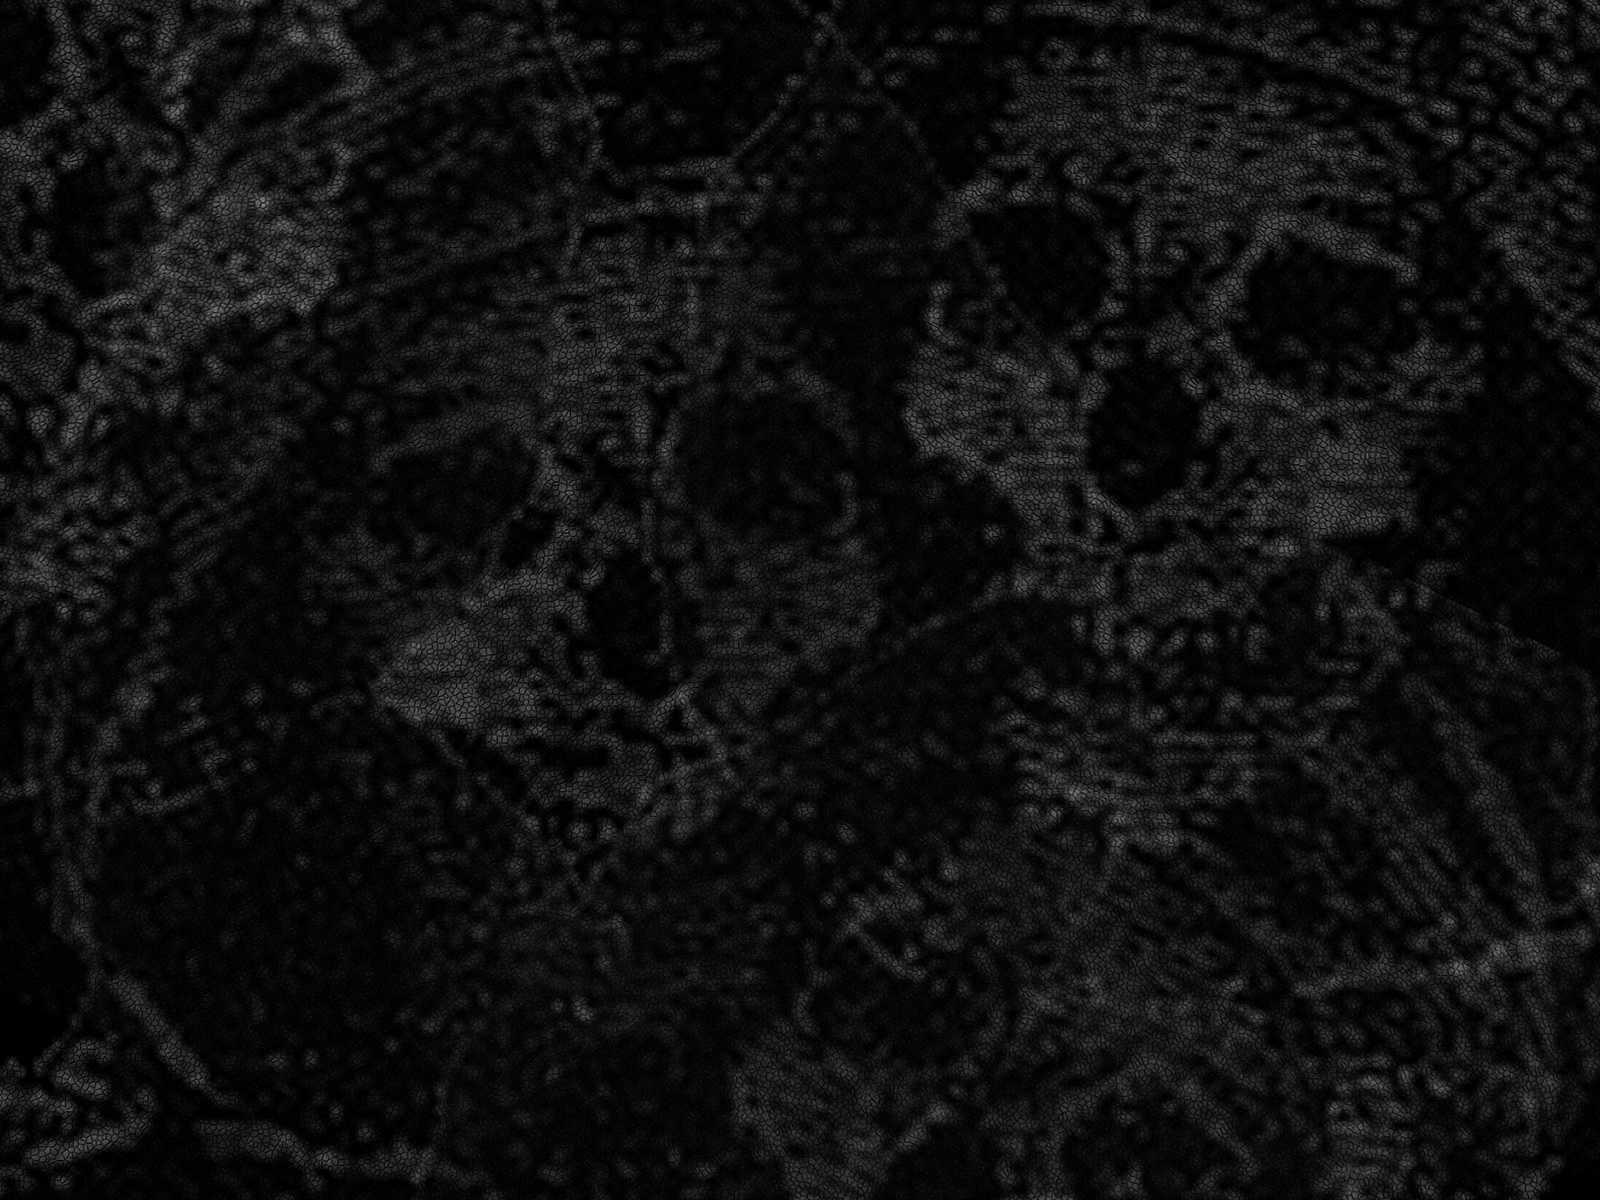 Dark Wallpaper 11 Cool Wallpaper - Hdblackwallpaper.com | 1600 x 1200 jpeg 422kB